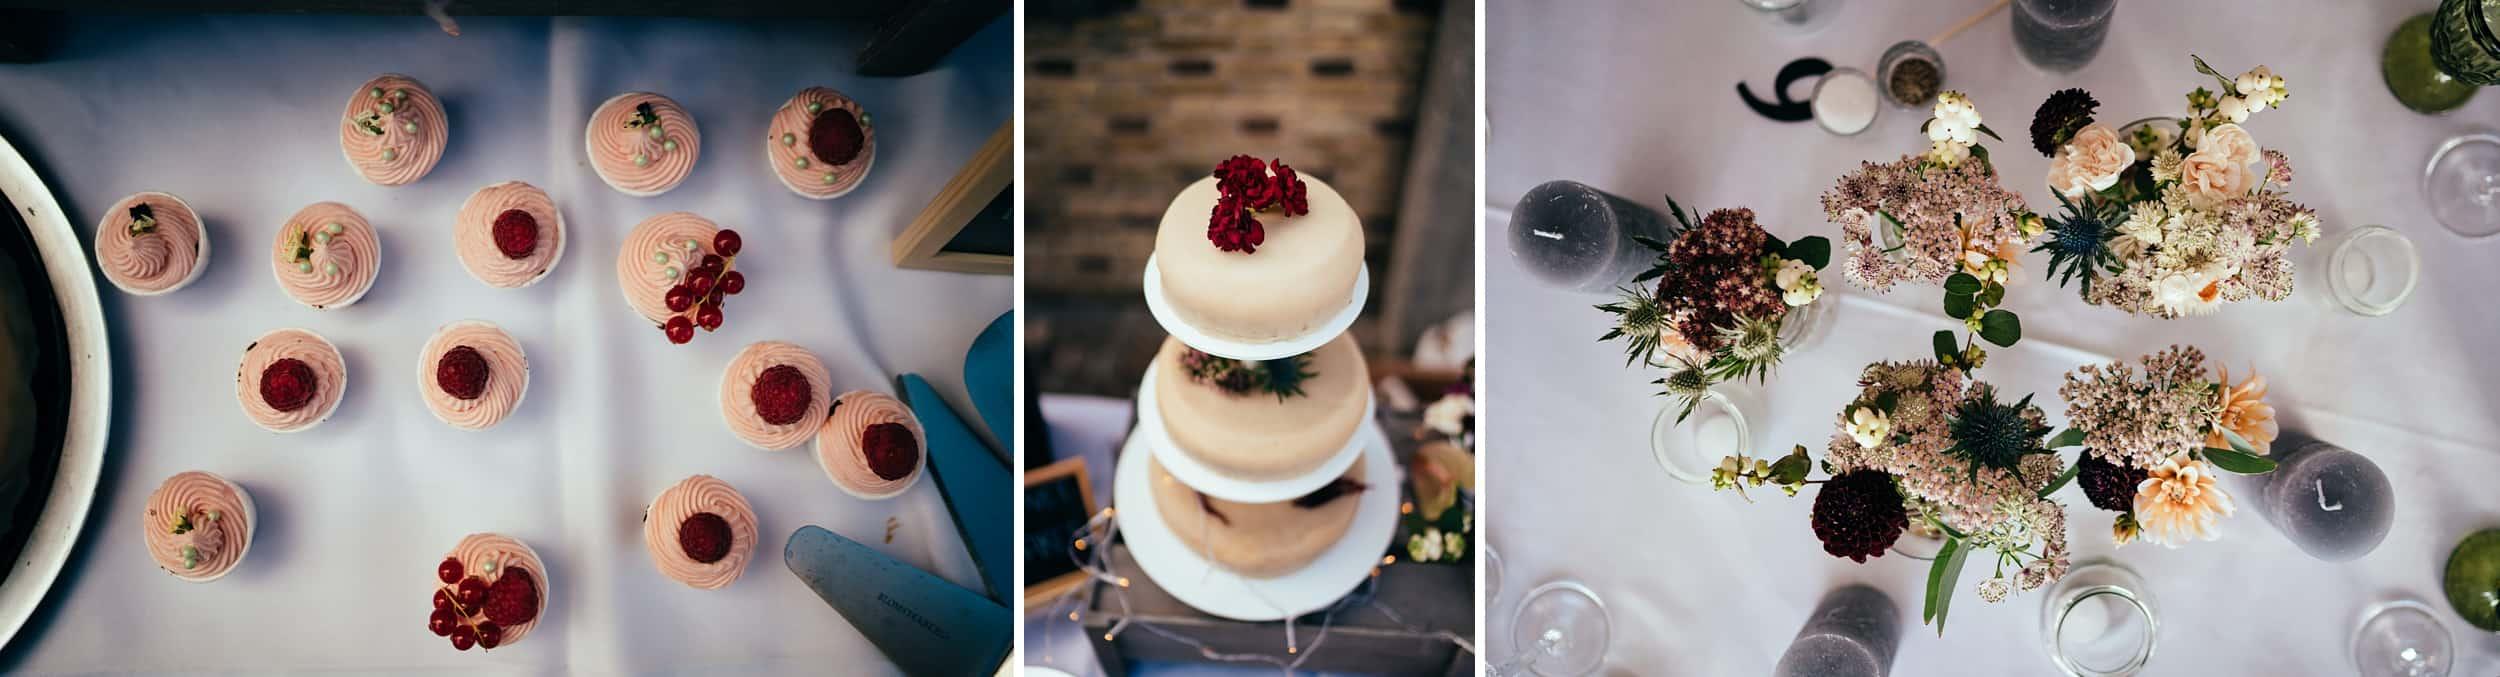 bryllupsdetaljer-kage.jpg